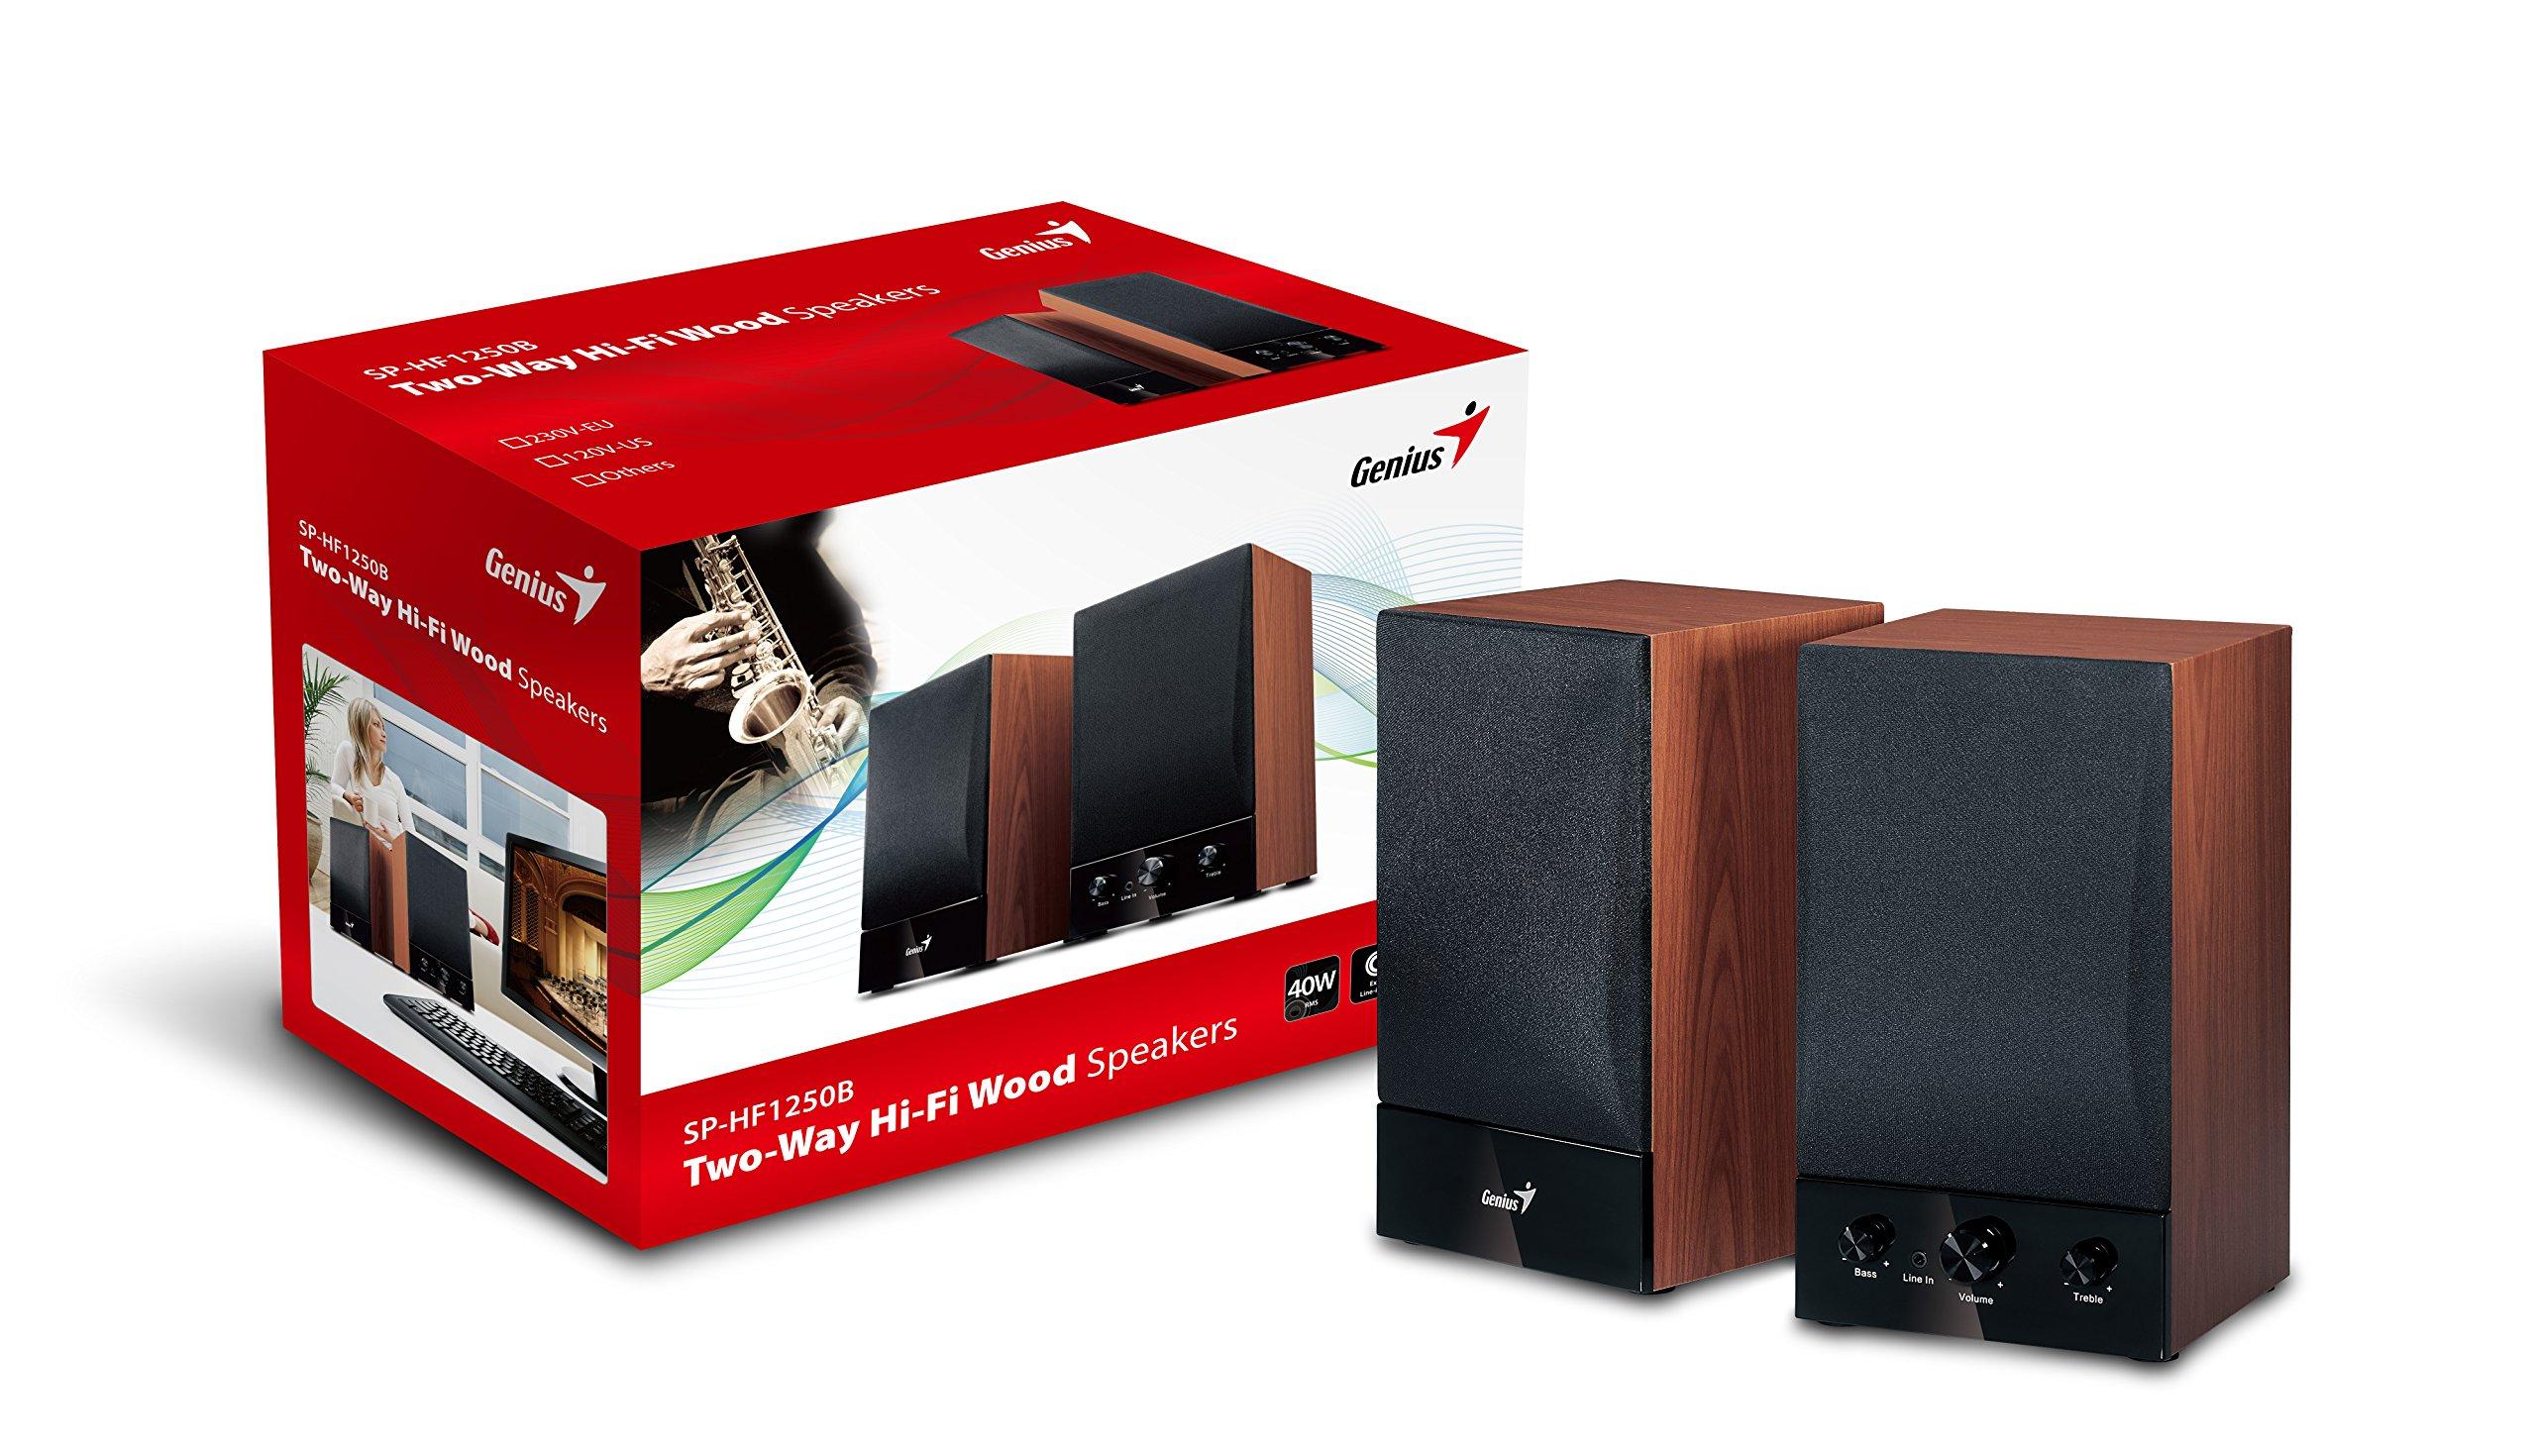 Genius-SP-HF1250B-2-Wege-Aktivbox-Lautsprecher-40-Watt-RMS